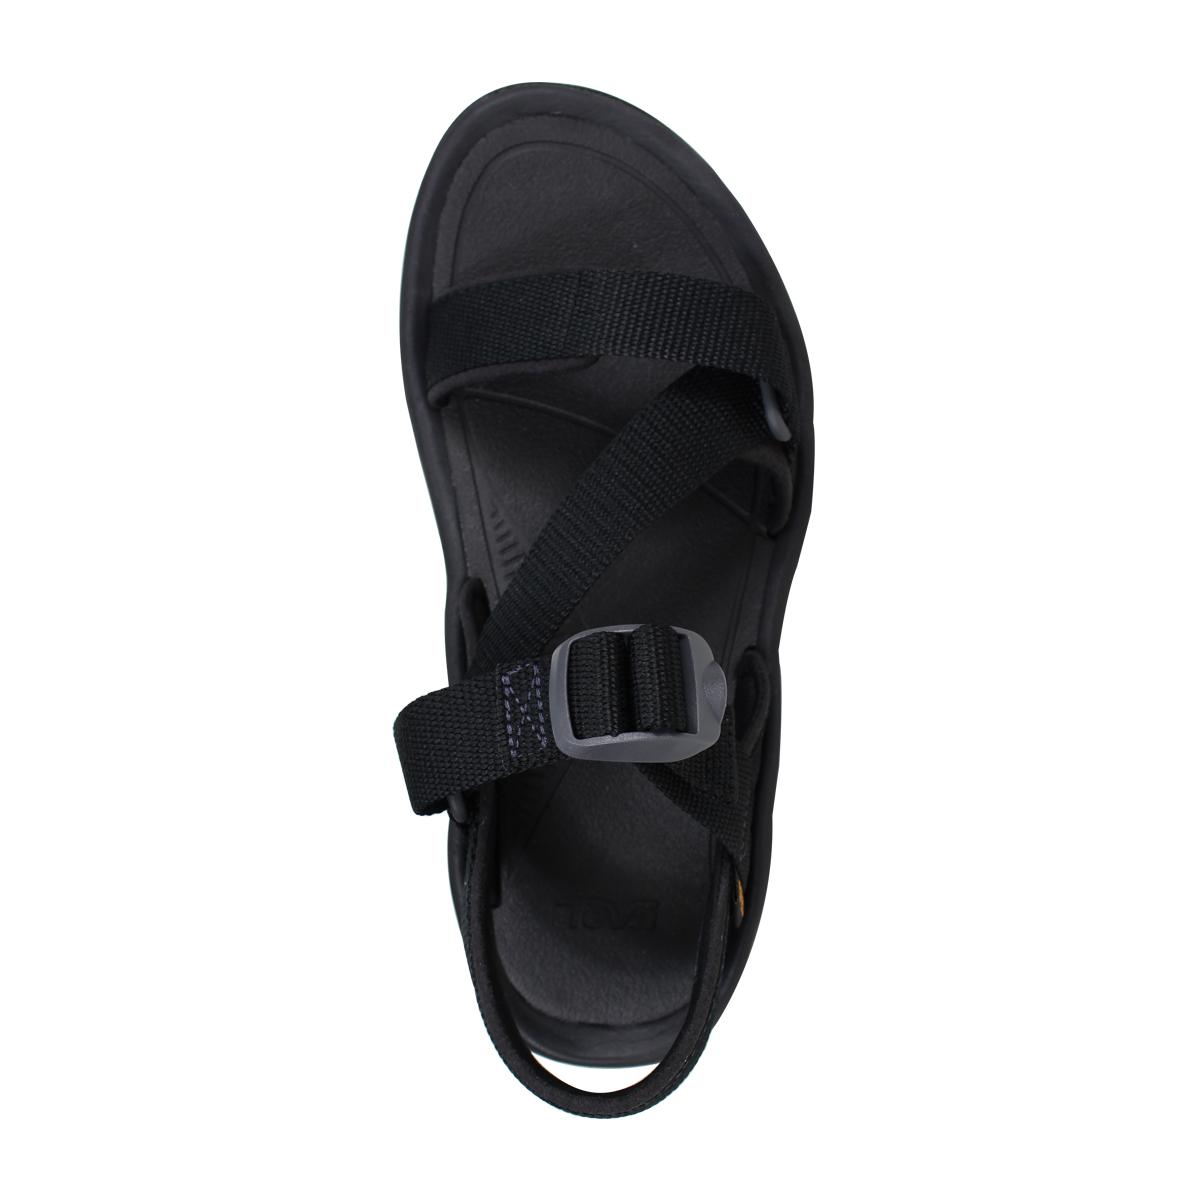 cba26040b369 Teva HURRICANE CROSS STRAP Teva sandals men hurricane XLT2 black dark olive  1091589  4 18 Shinnyu load   184